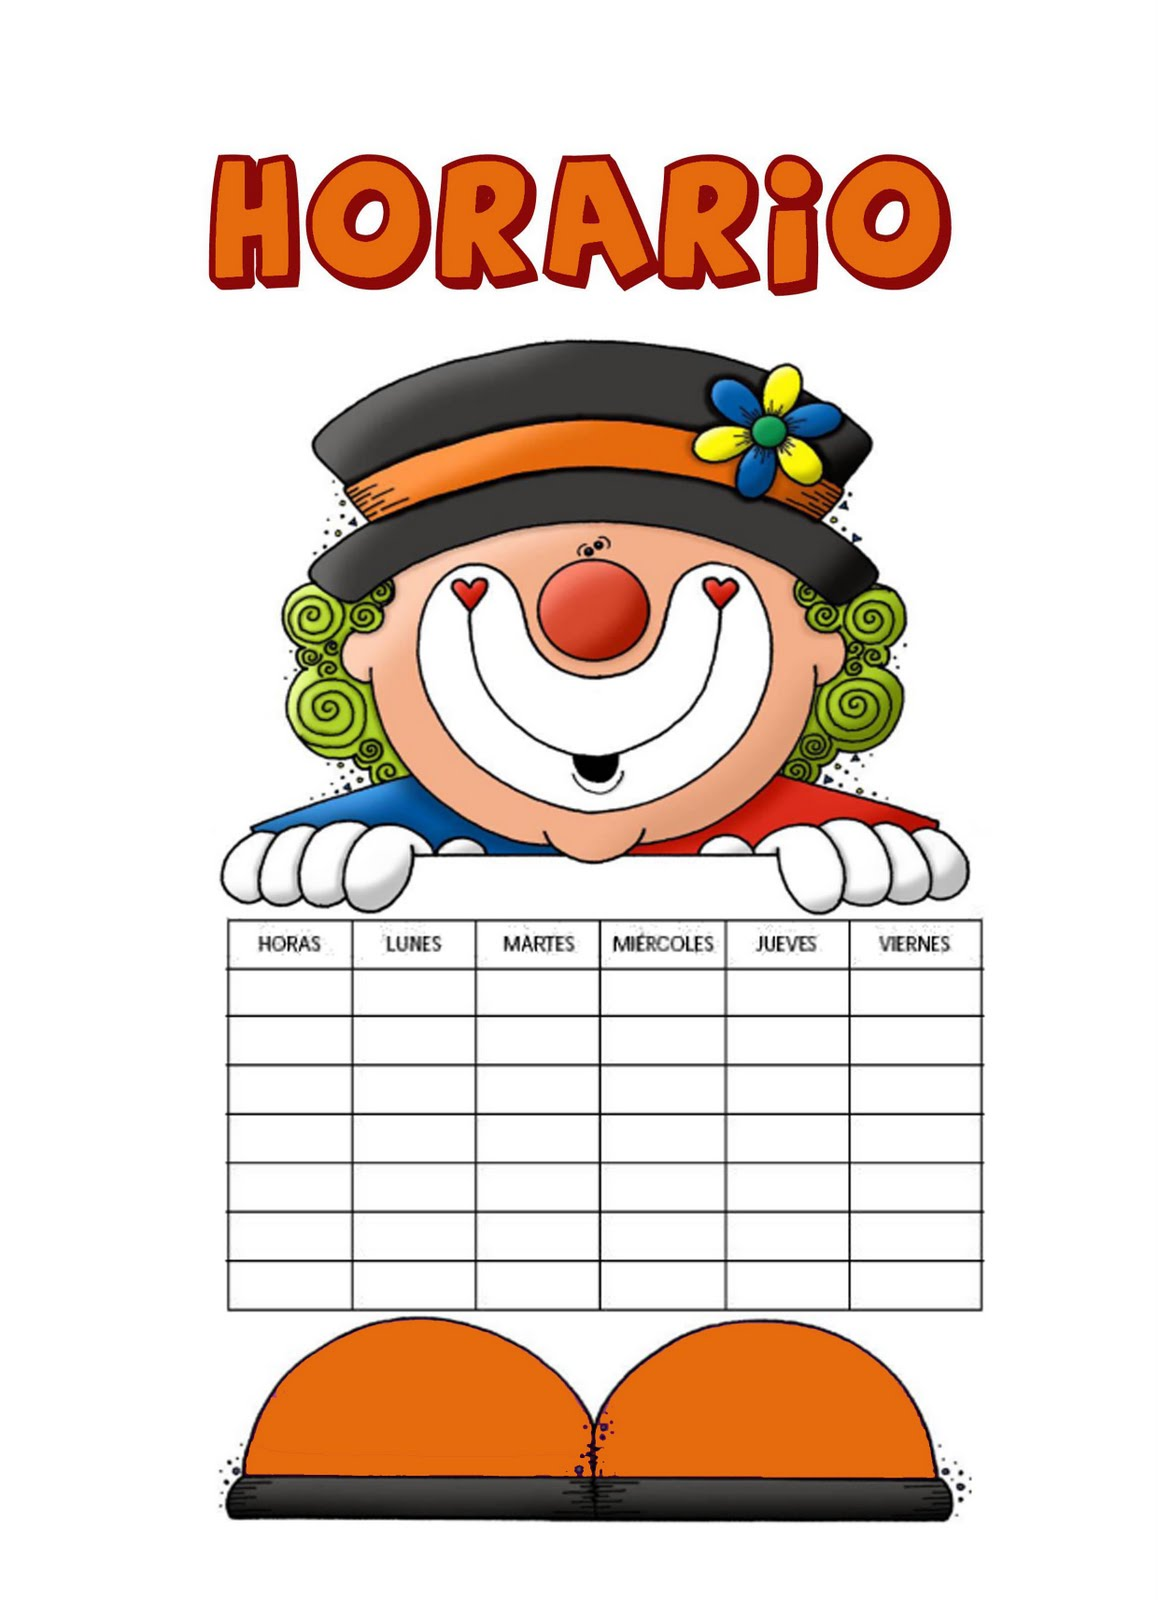 Horario tutorias y reuniones de 3 b infantil cpeip san for Cartel comedor infantil